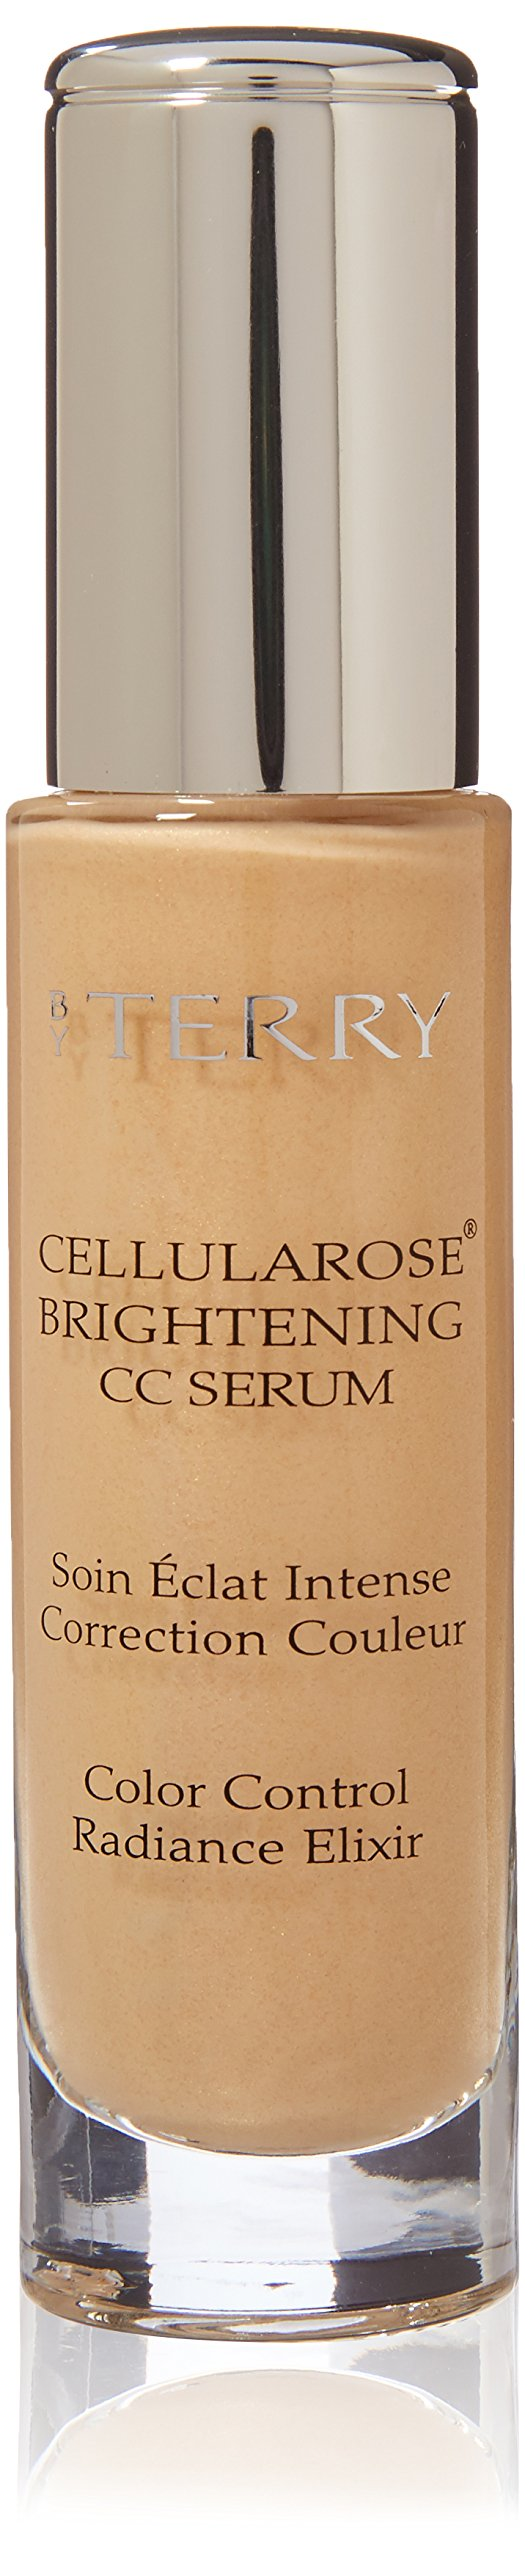 BY TERRY Cellularose Brigthening CC Serum #3 Apricot Glow - 30ml